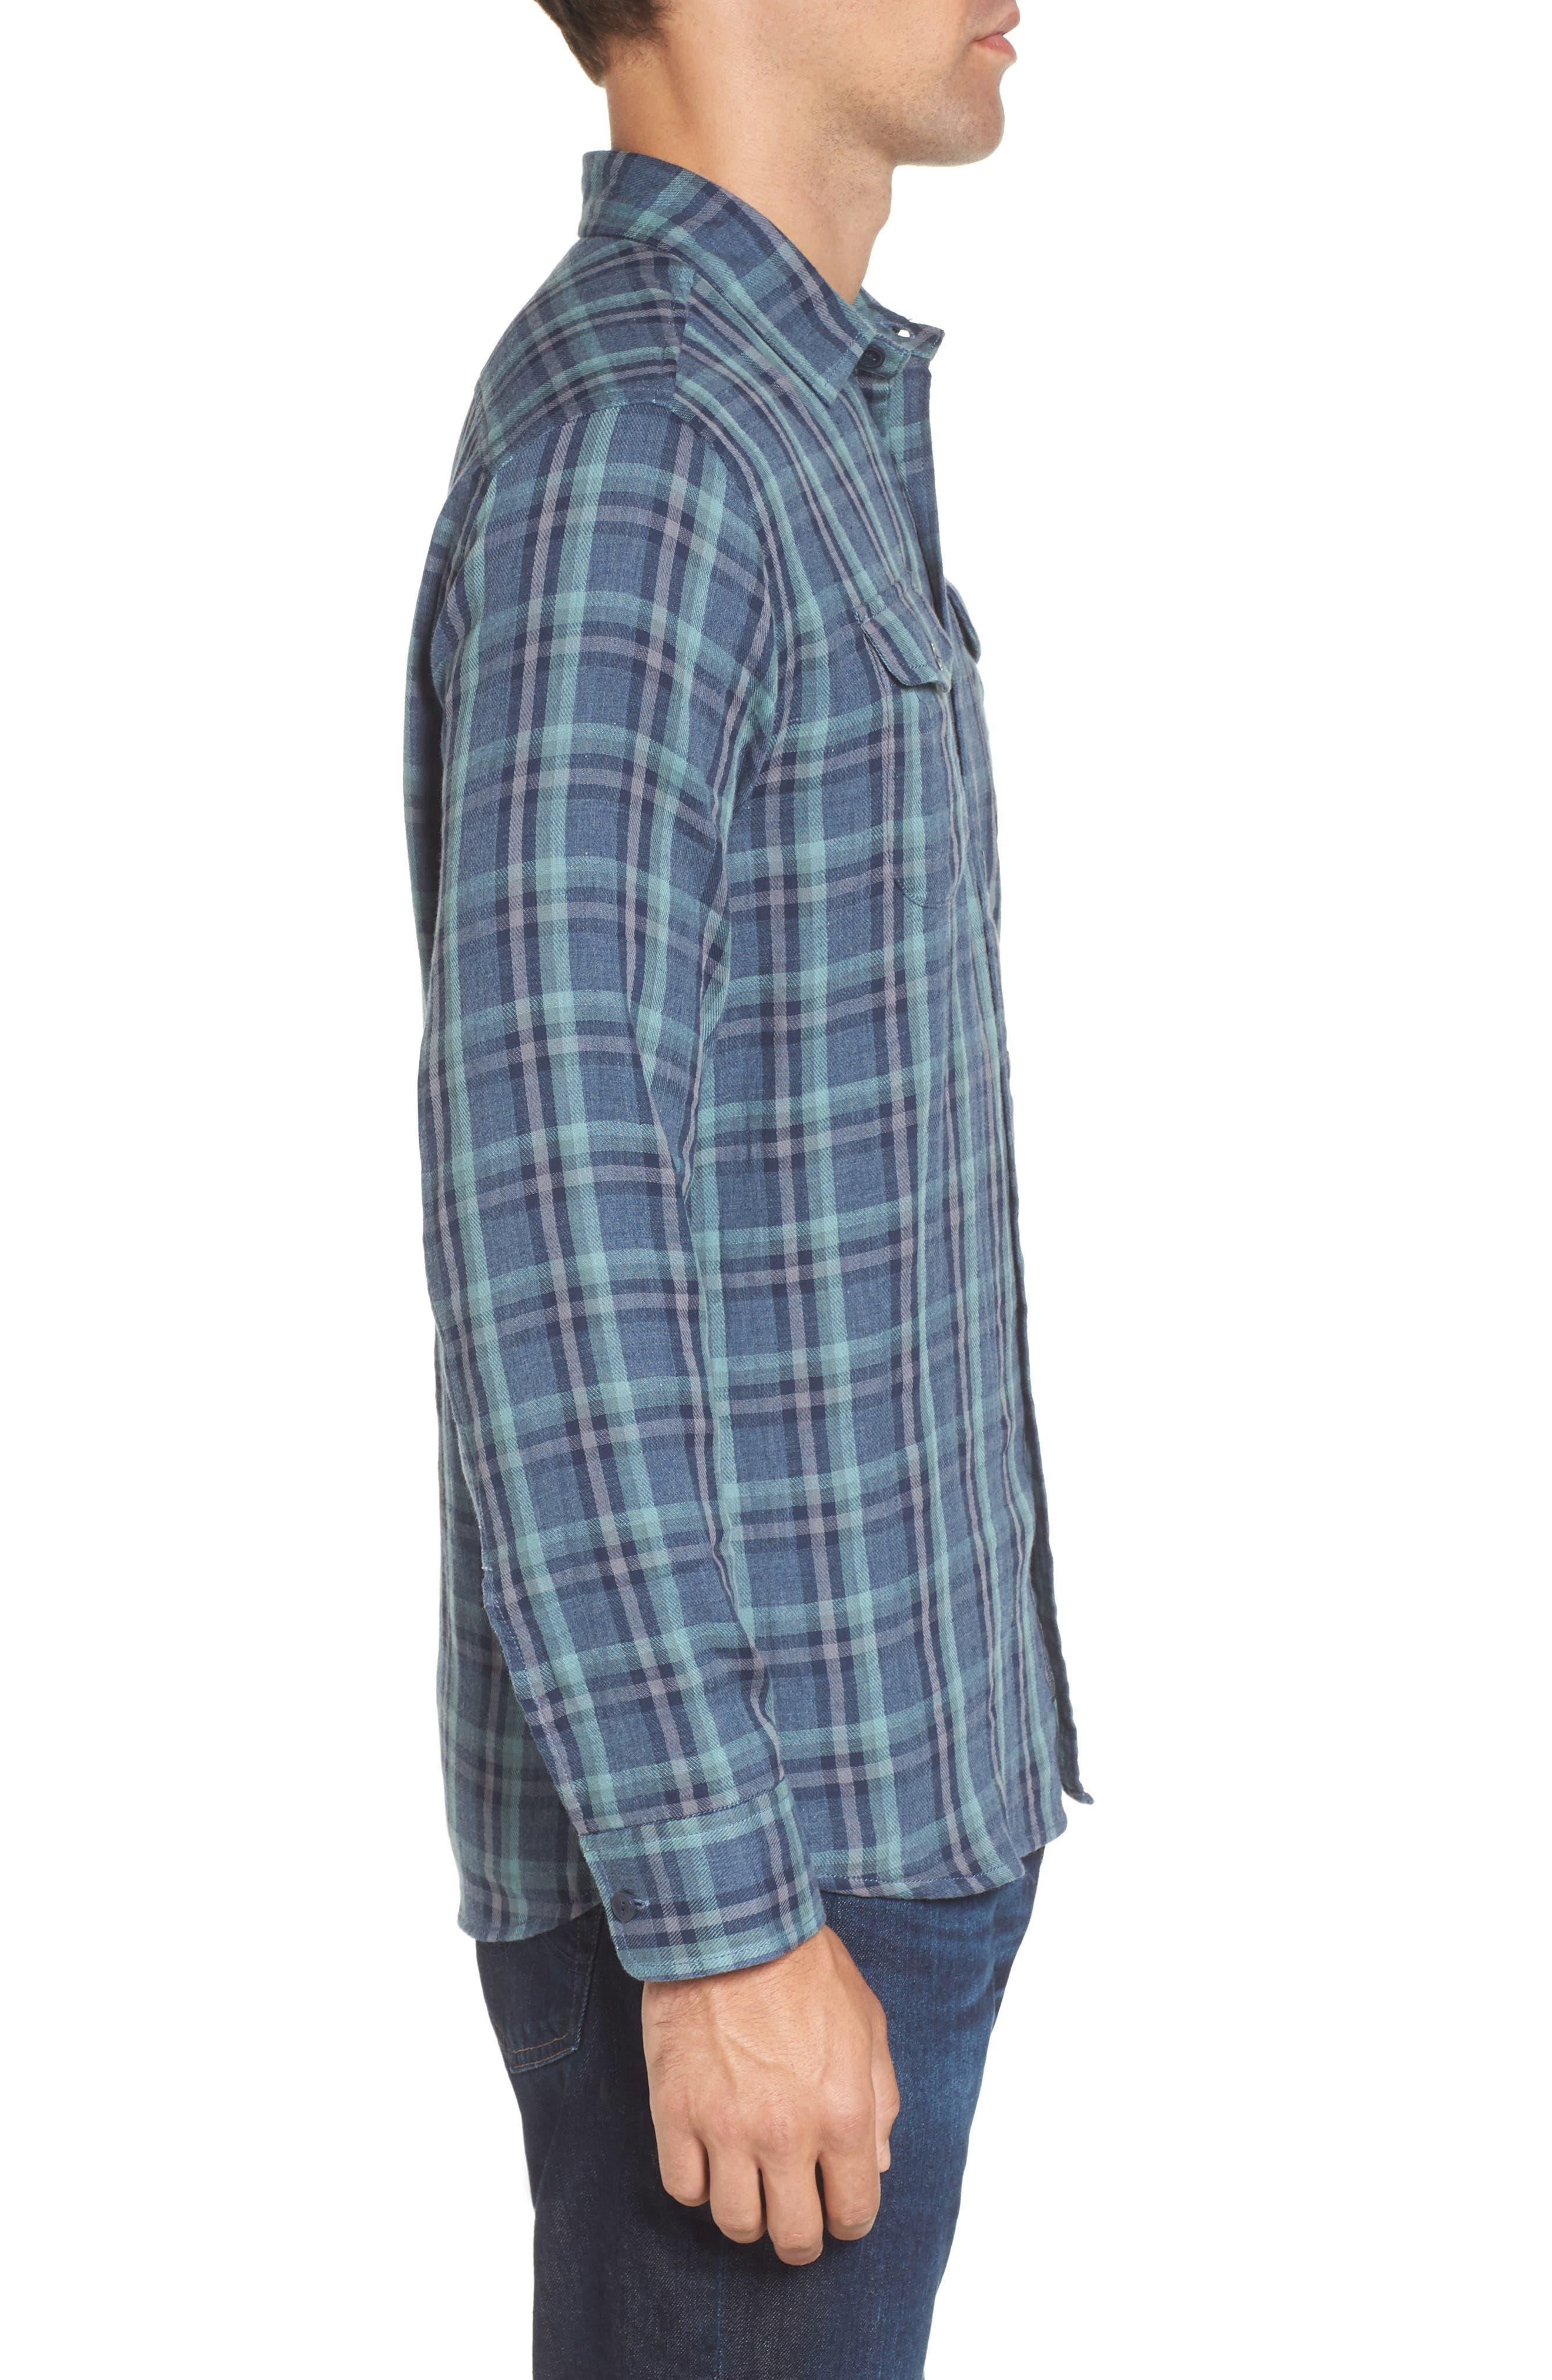 Smith Double Cloth Plaid Sport Shirt,                             Alternate thumbnail 3, color,                             Blue Navy Seafoam